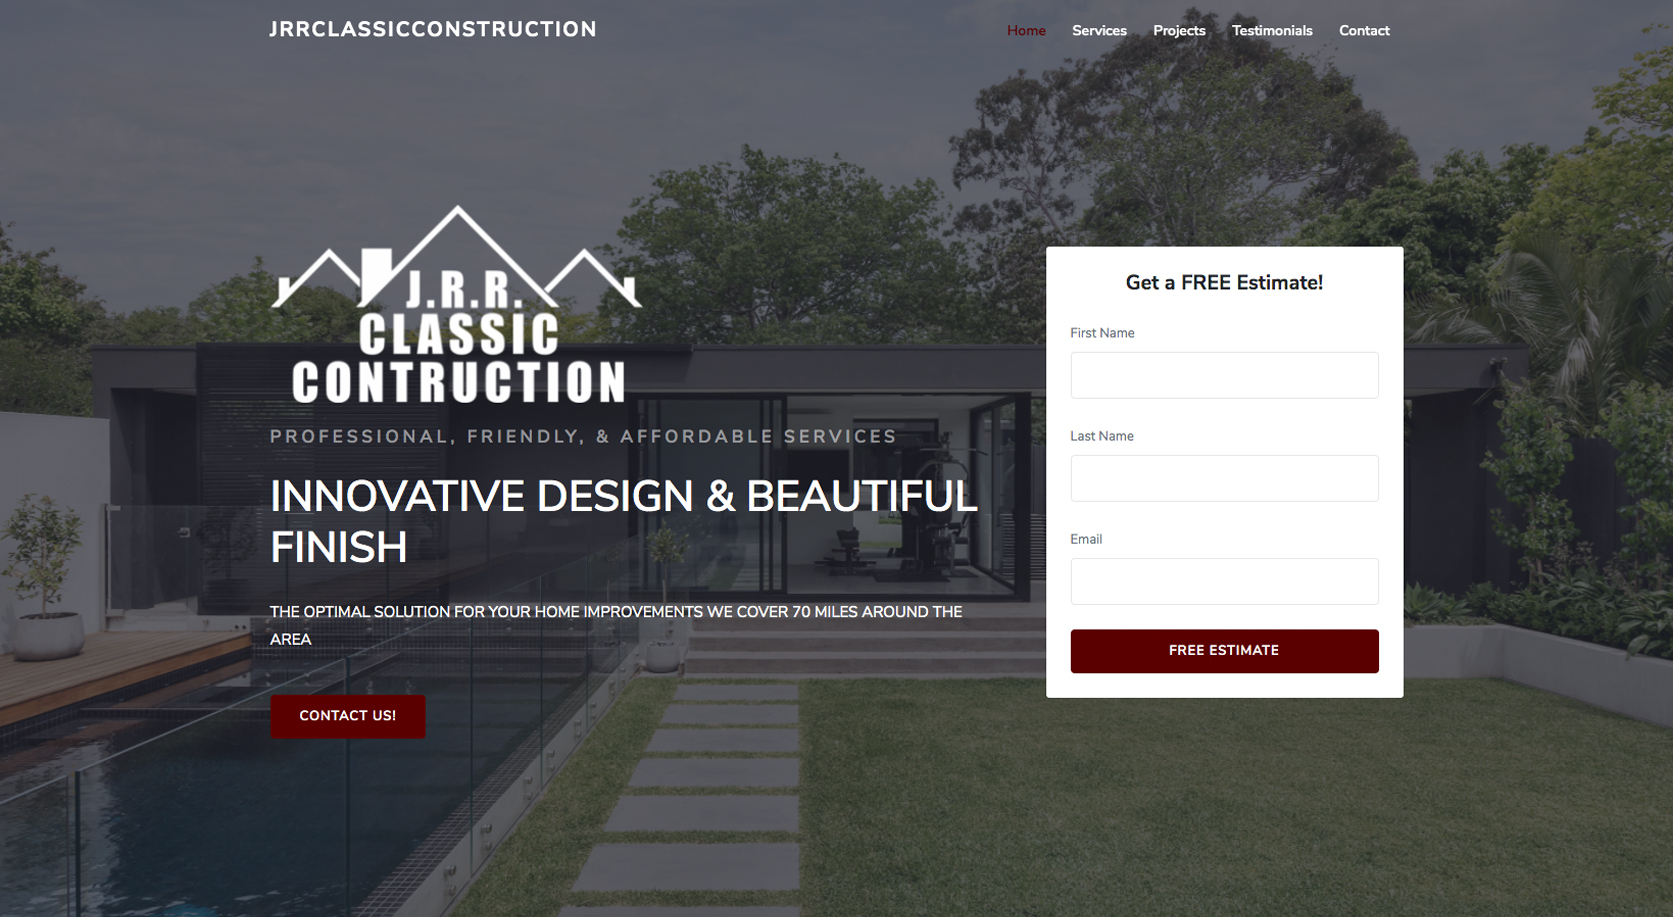 J.R.R Classic Construction